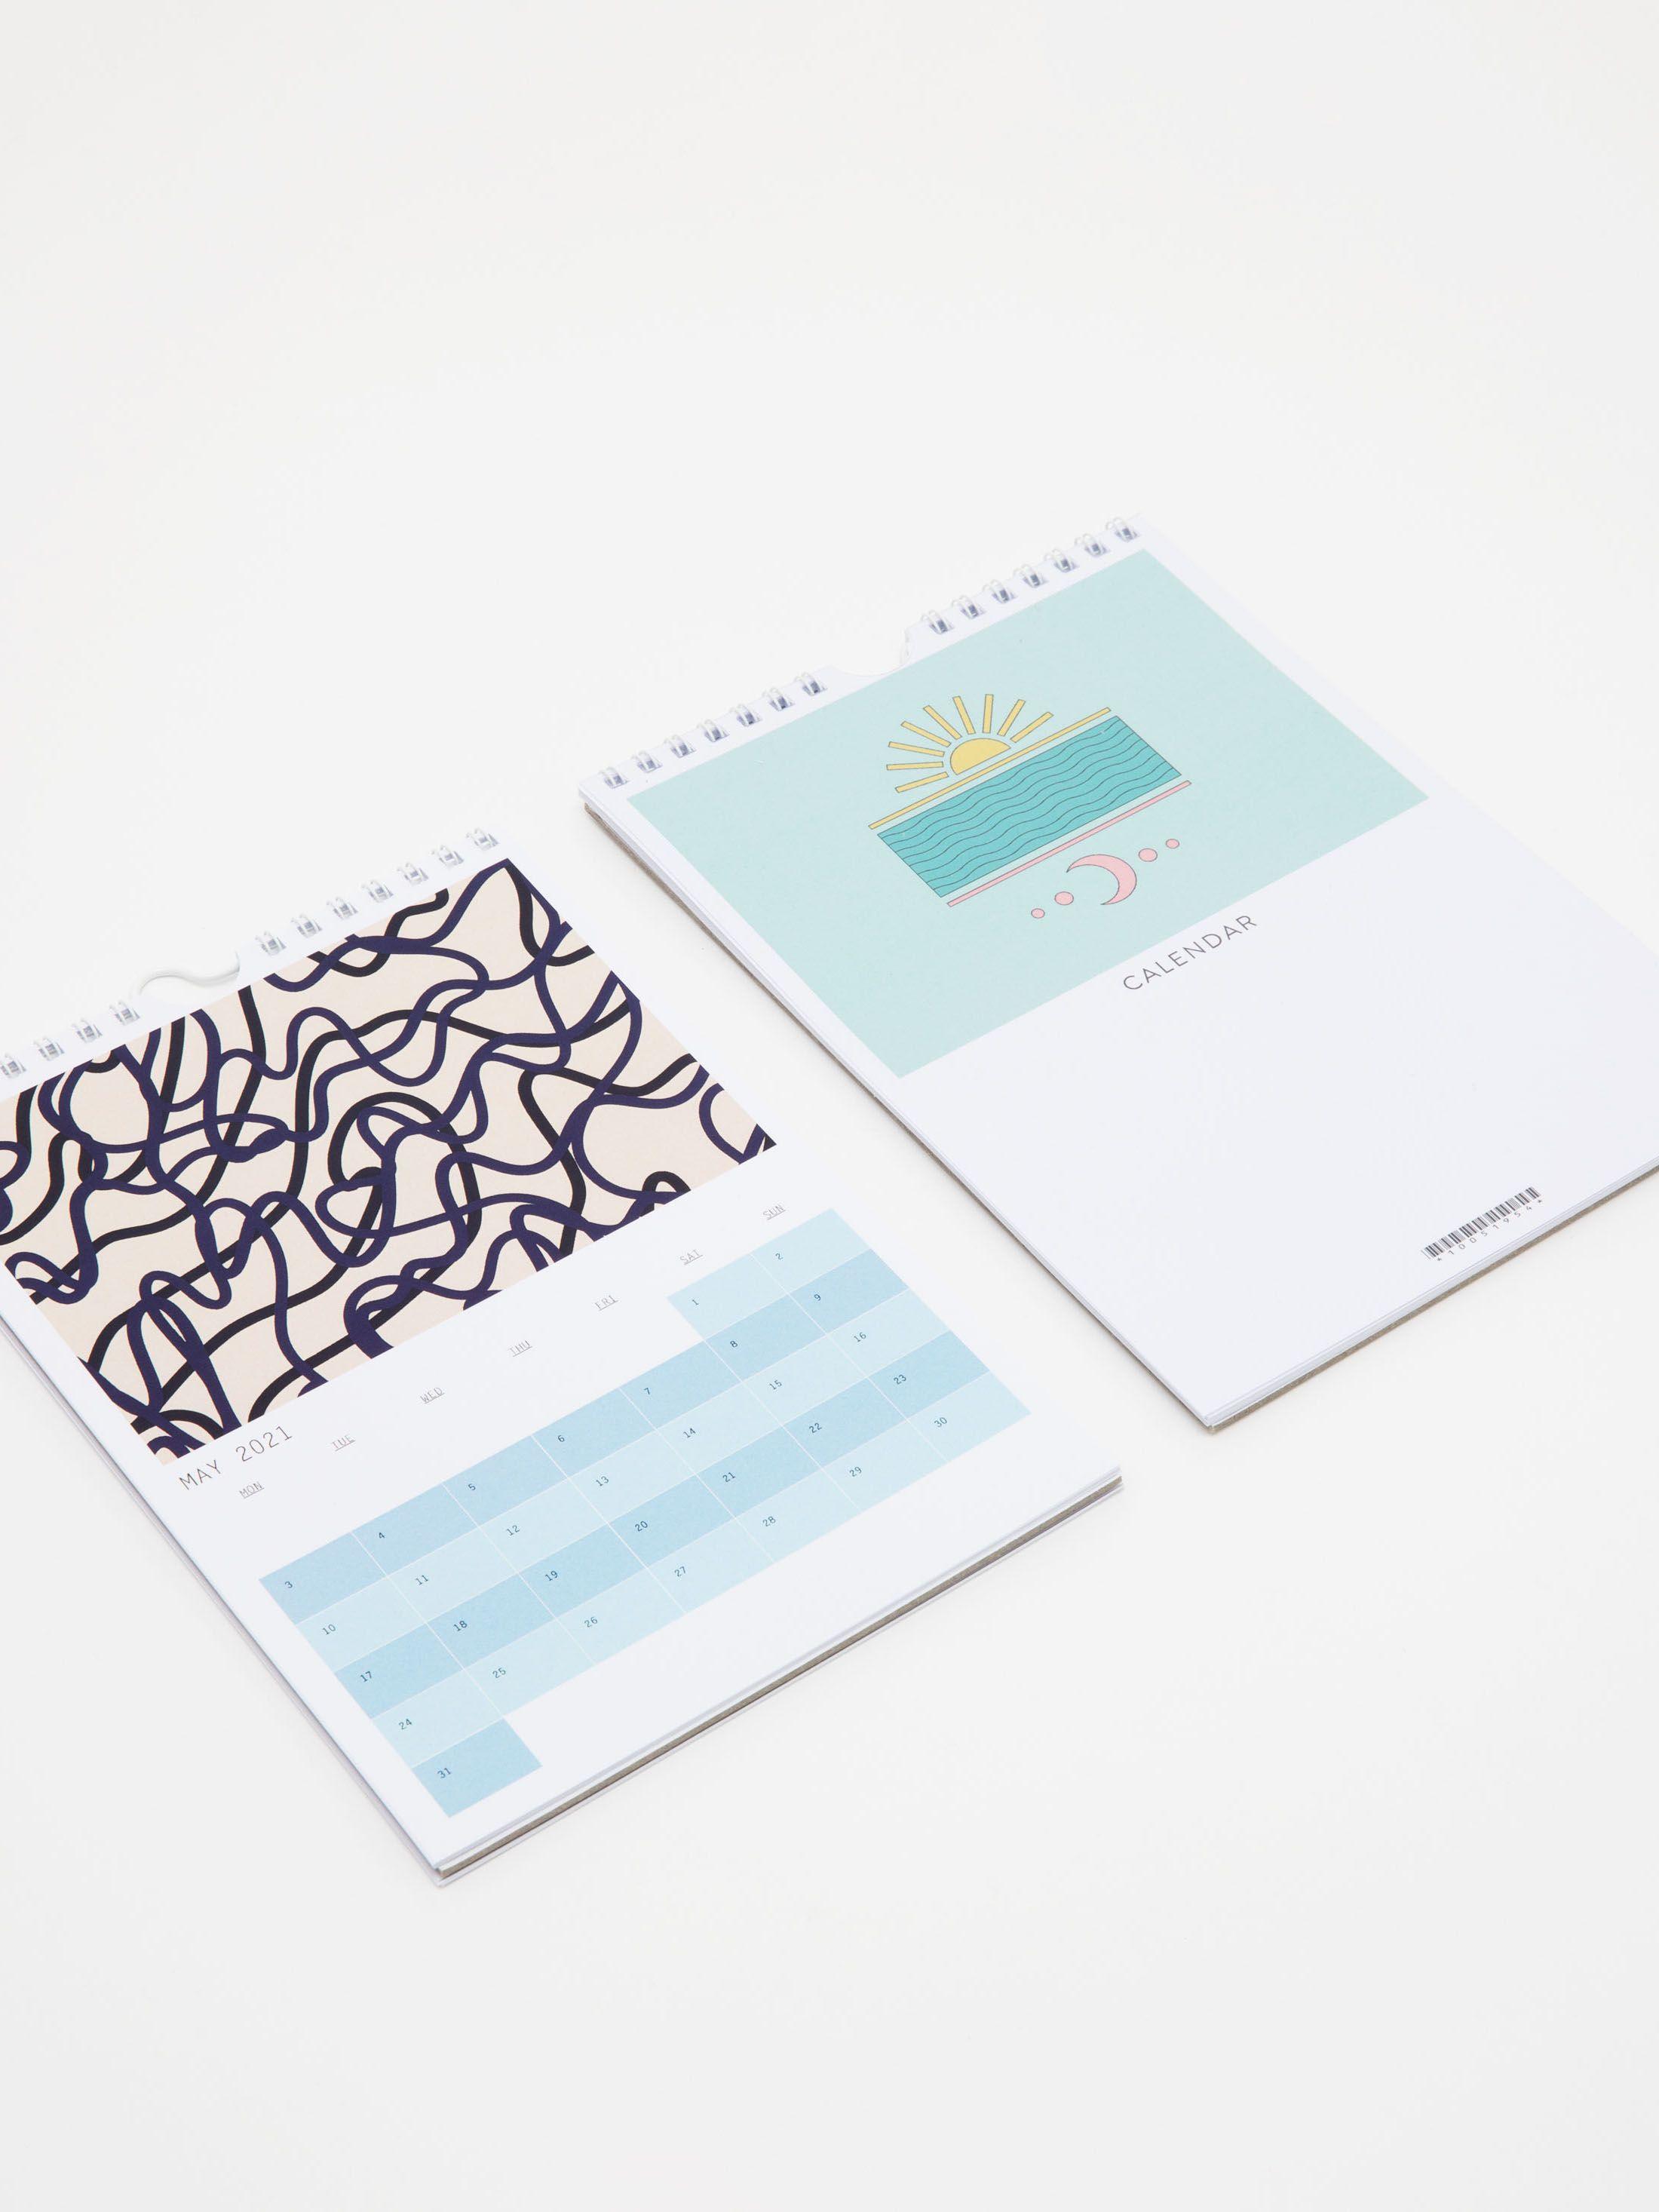 DIN A5 Kalender selbst gestalten